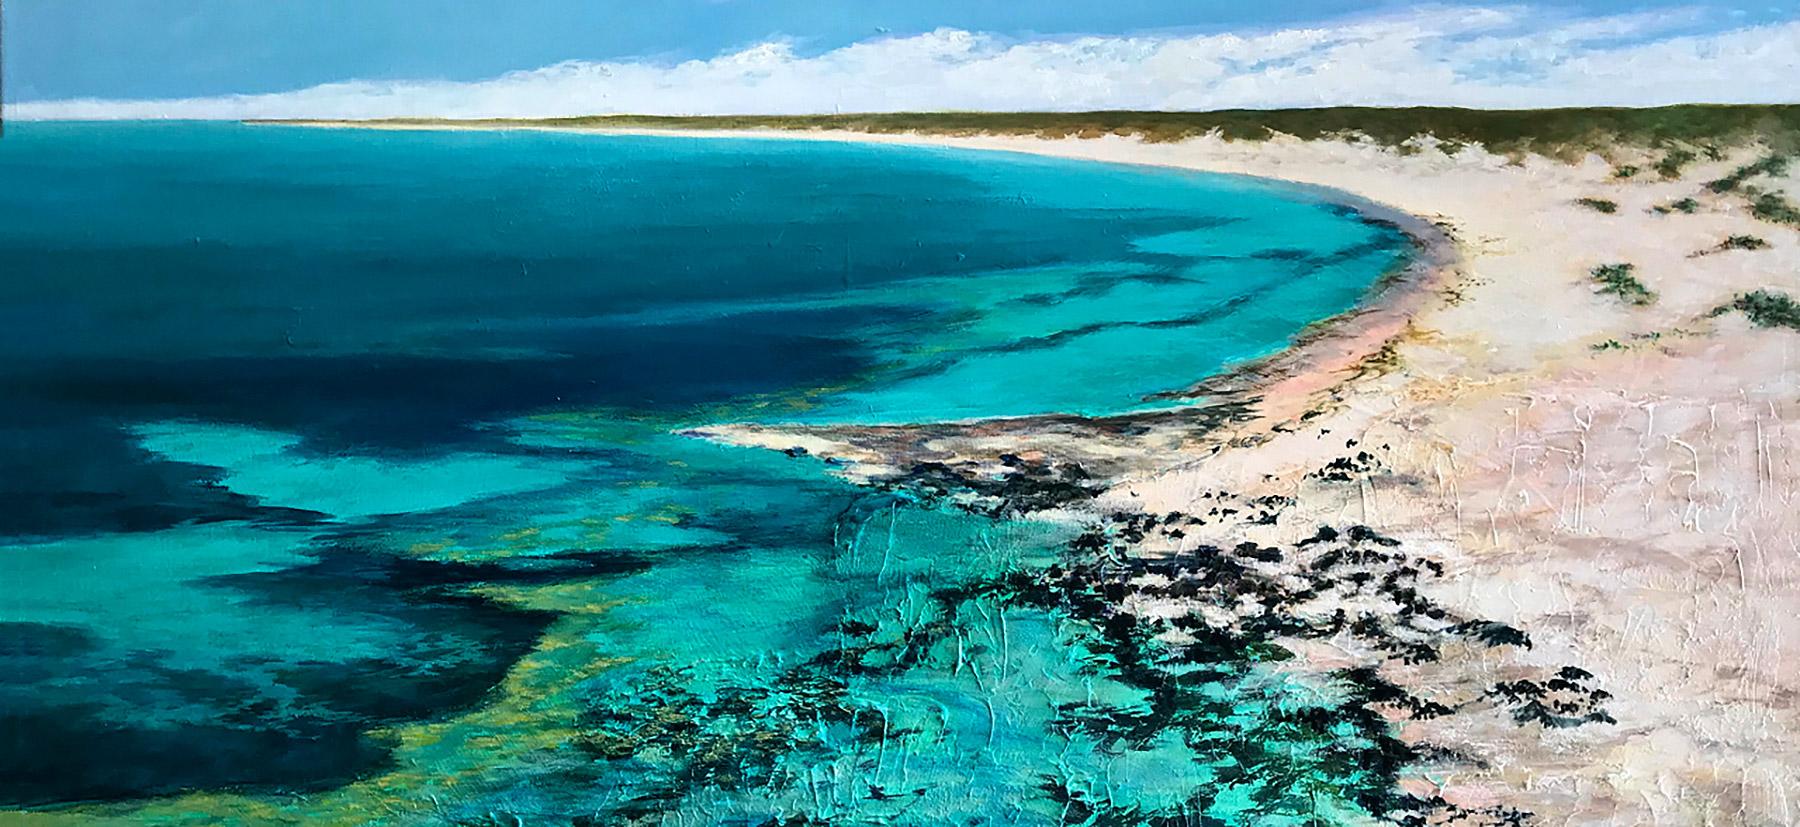 Lindy Midalia - 'Across The Reef' Bio Page